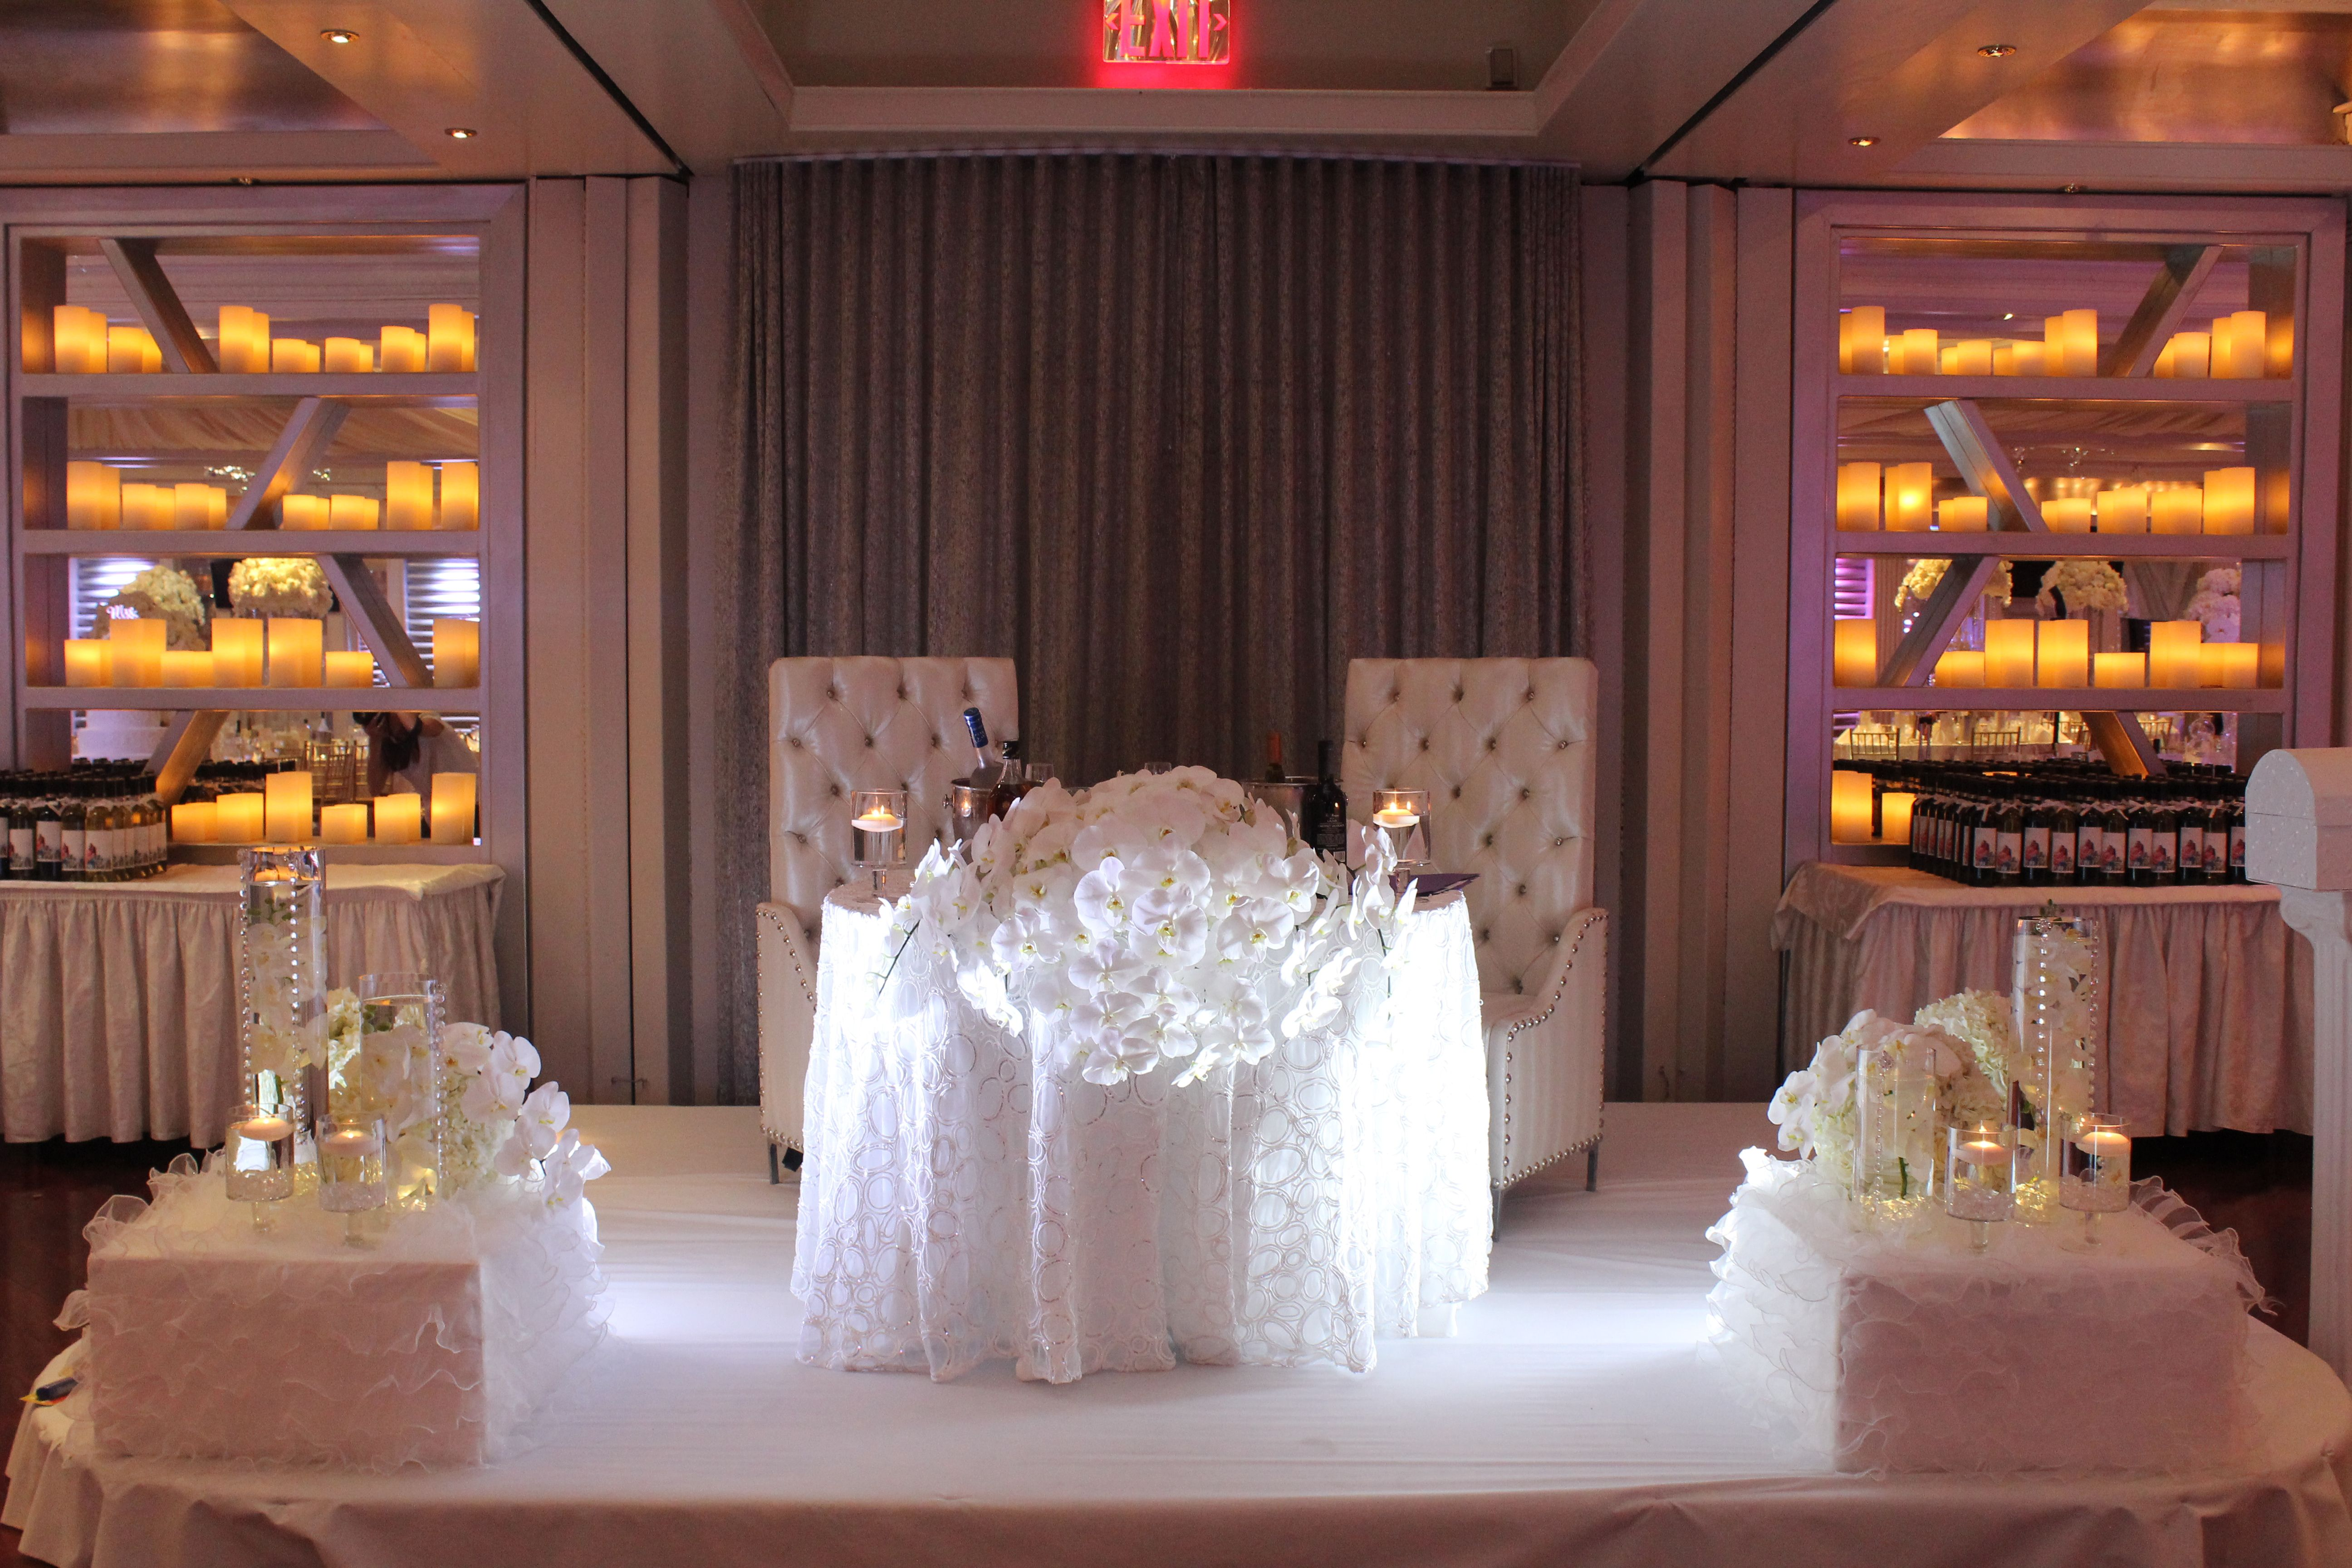 Superb White Orchids Dais Table Chateau Briand Tofny.com